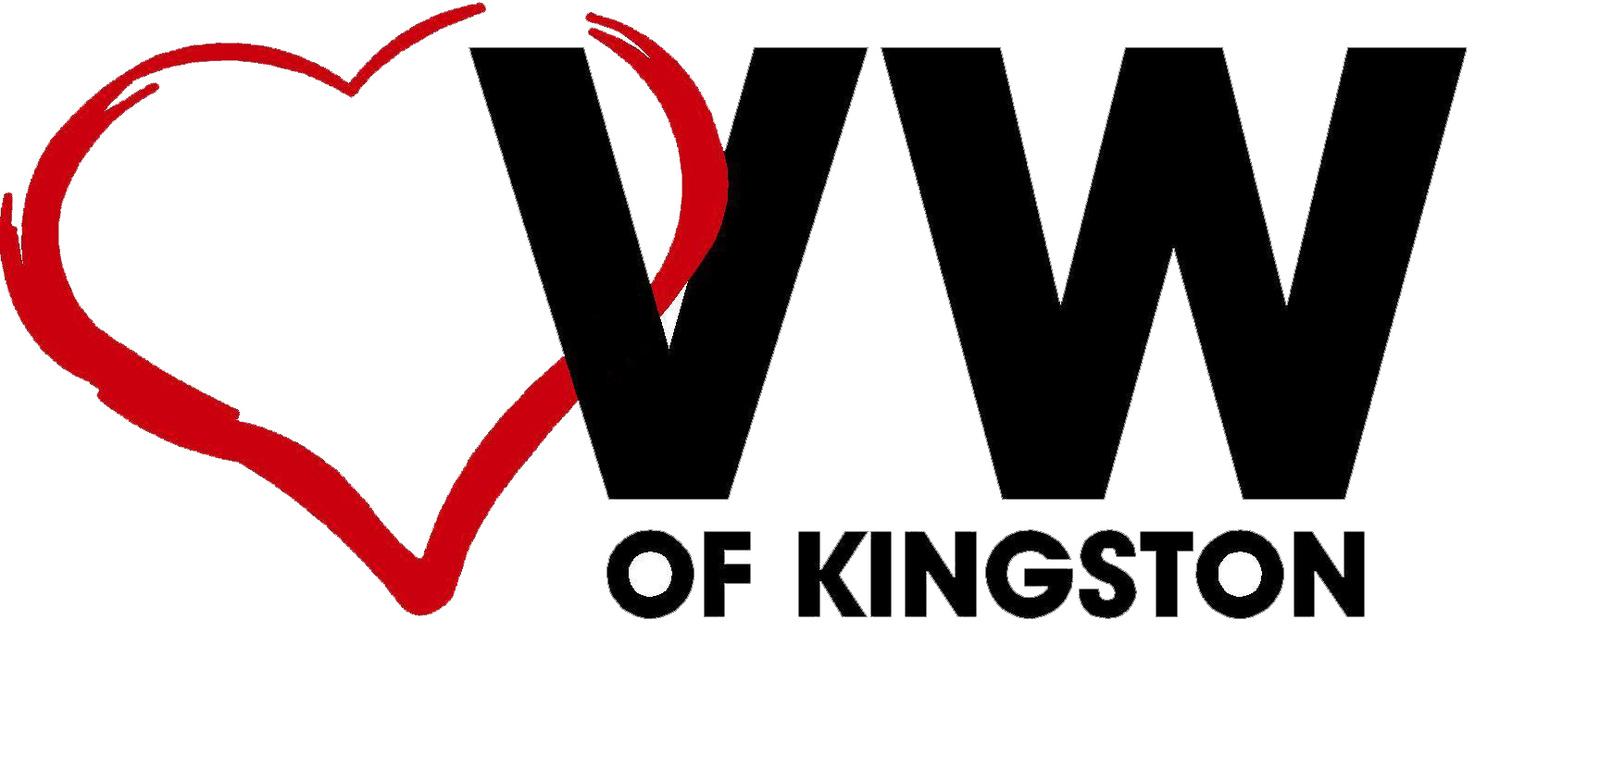 Http Www Vwofkingston Net Used Cars Kingston Ny